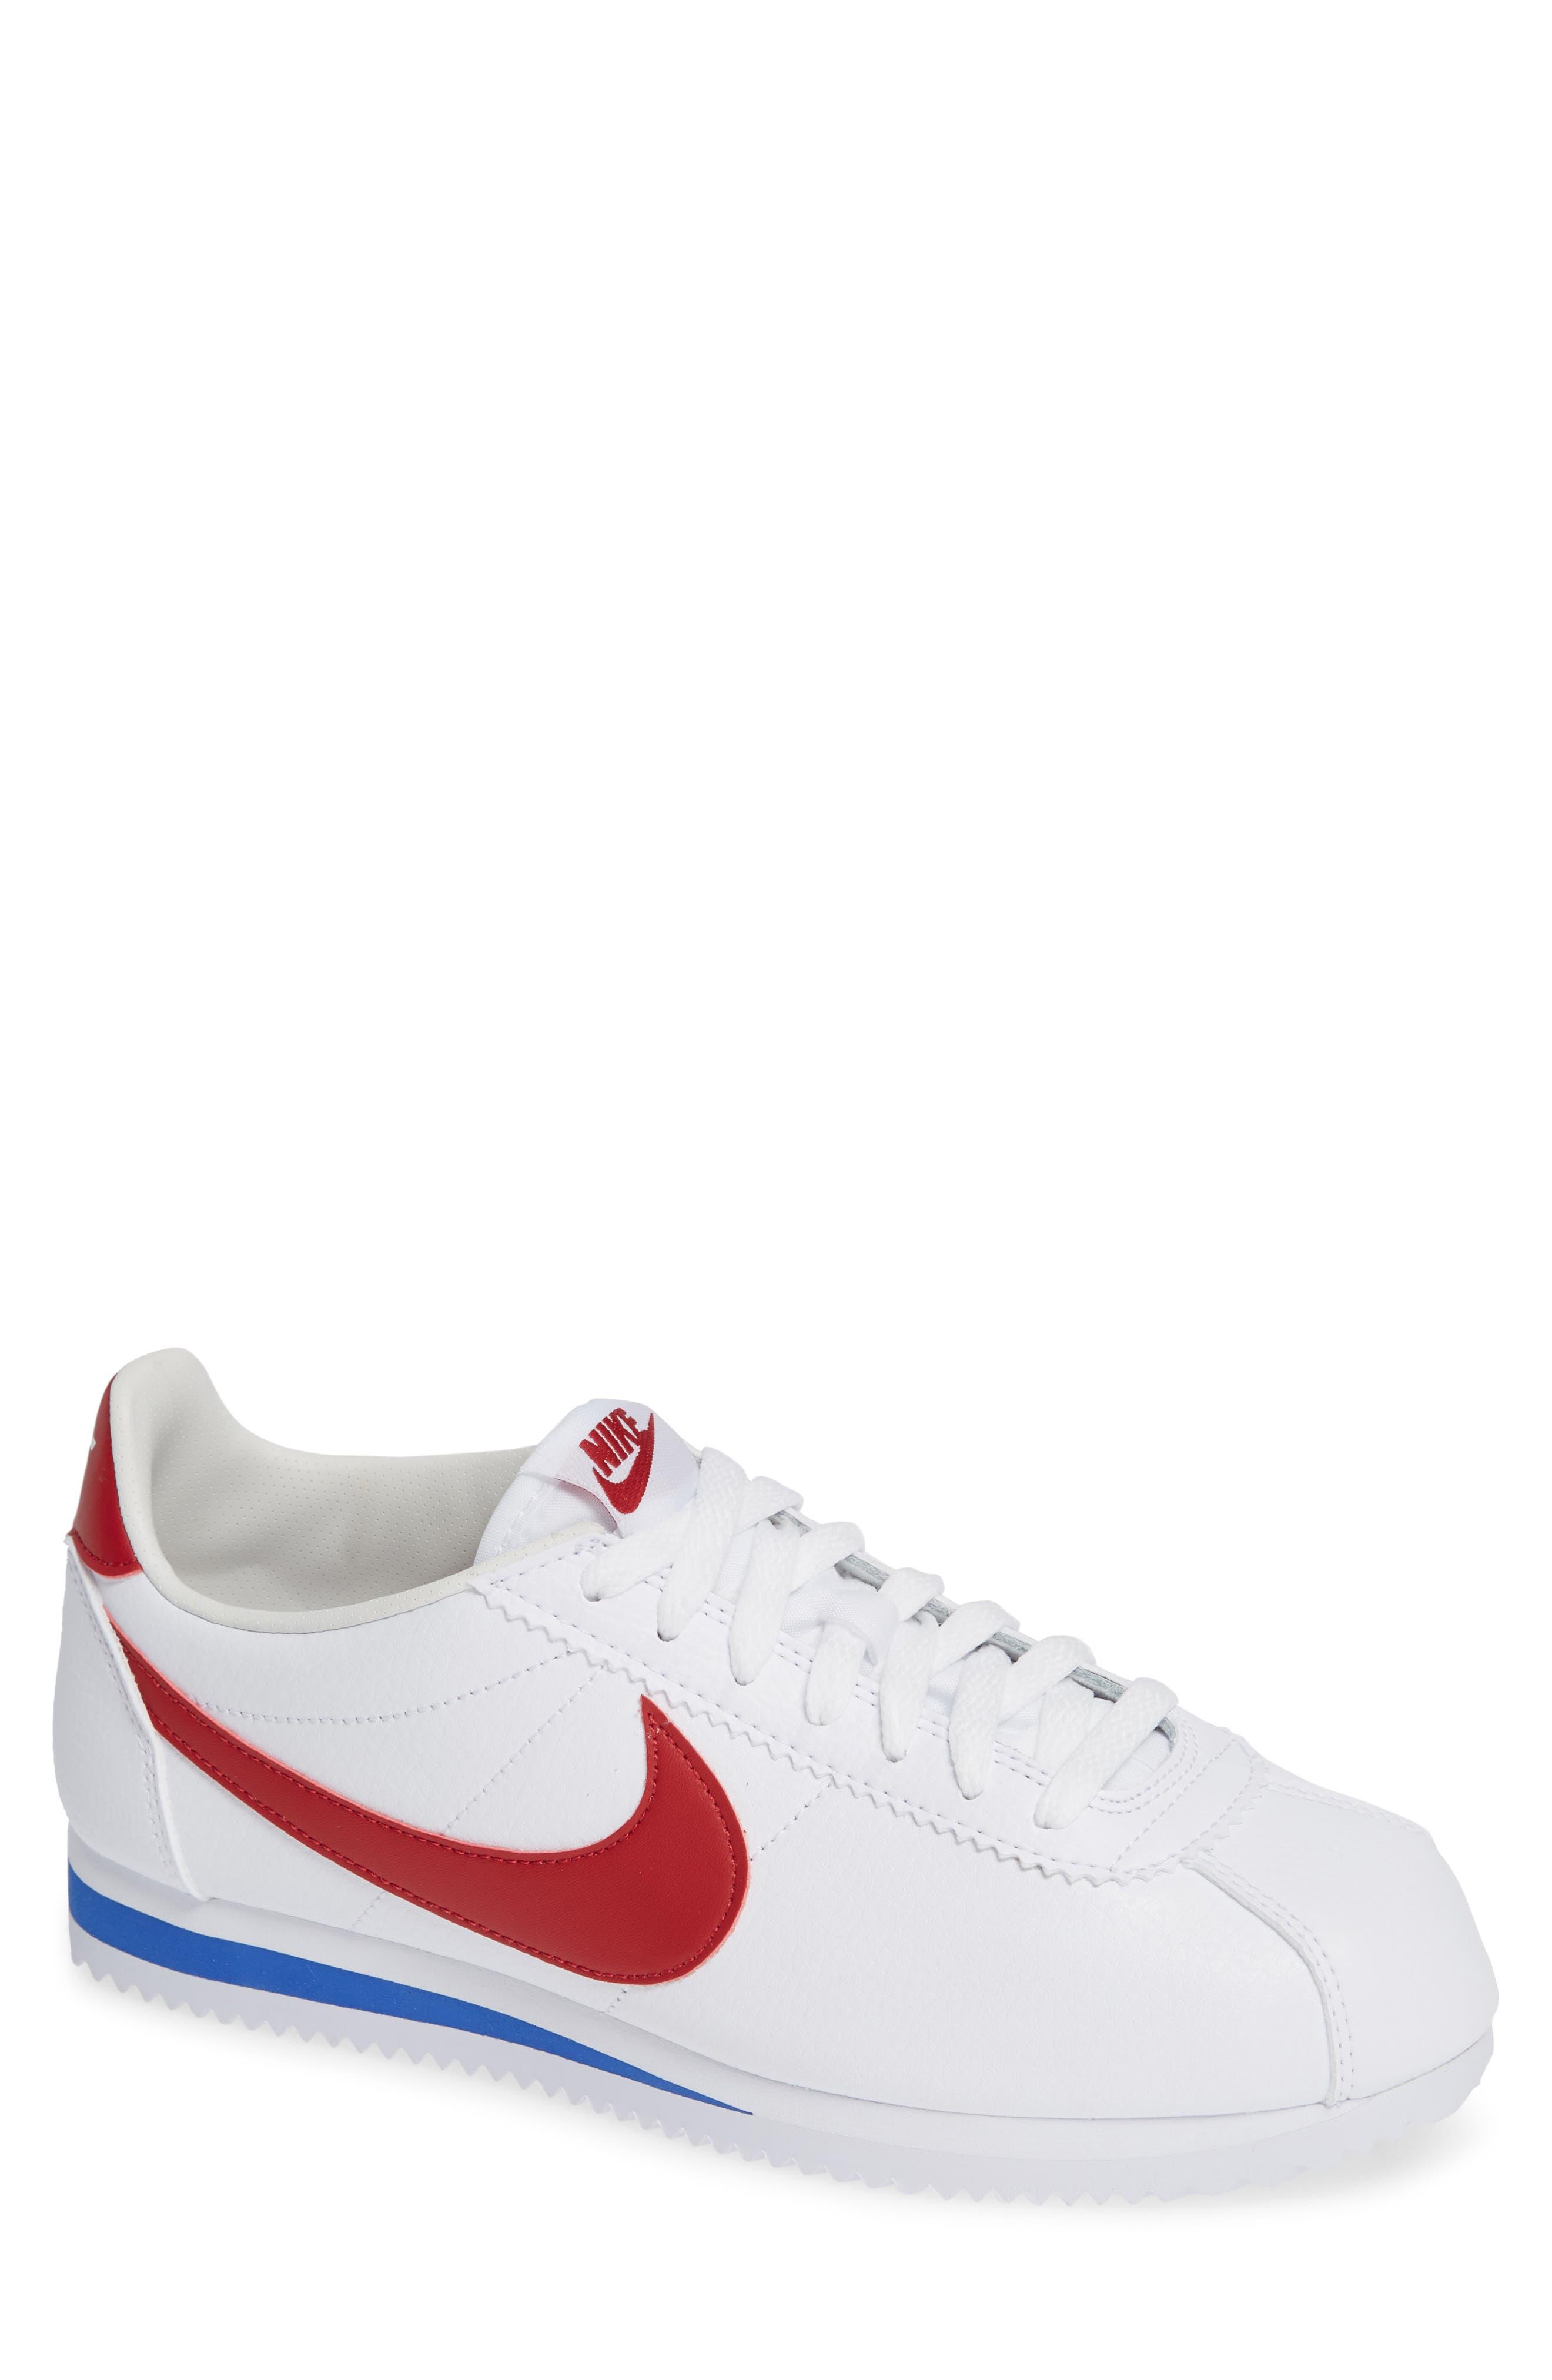 Classic Cortez Sneaker,                             Main thumbnail 1, color,                             White/ Varsity Red/ Royal